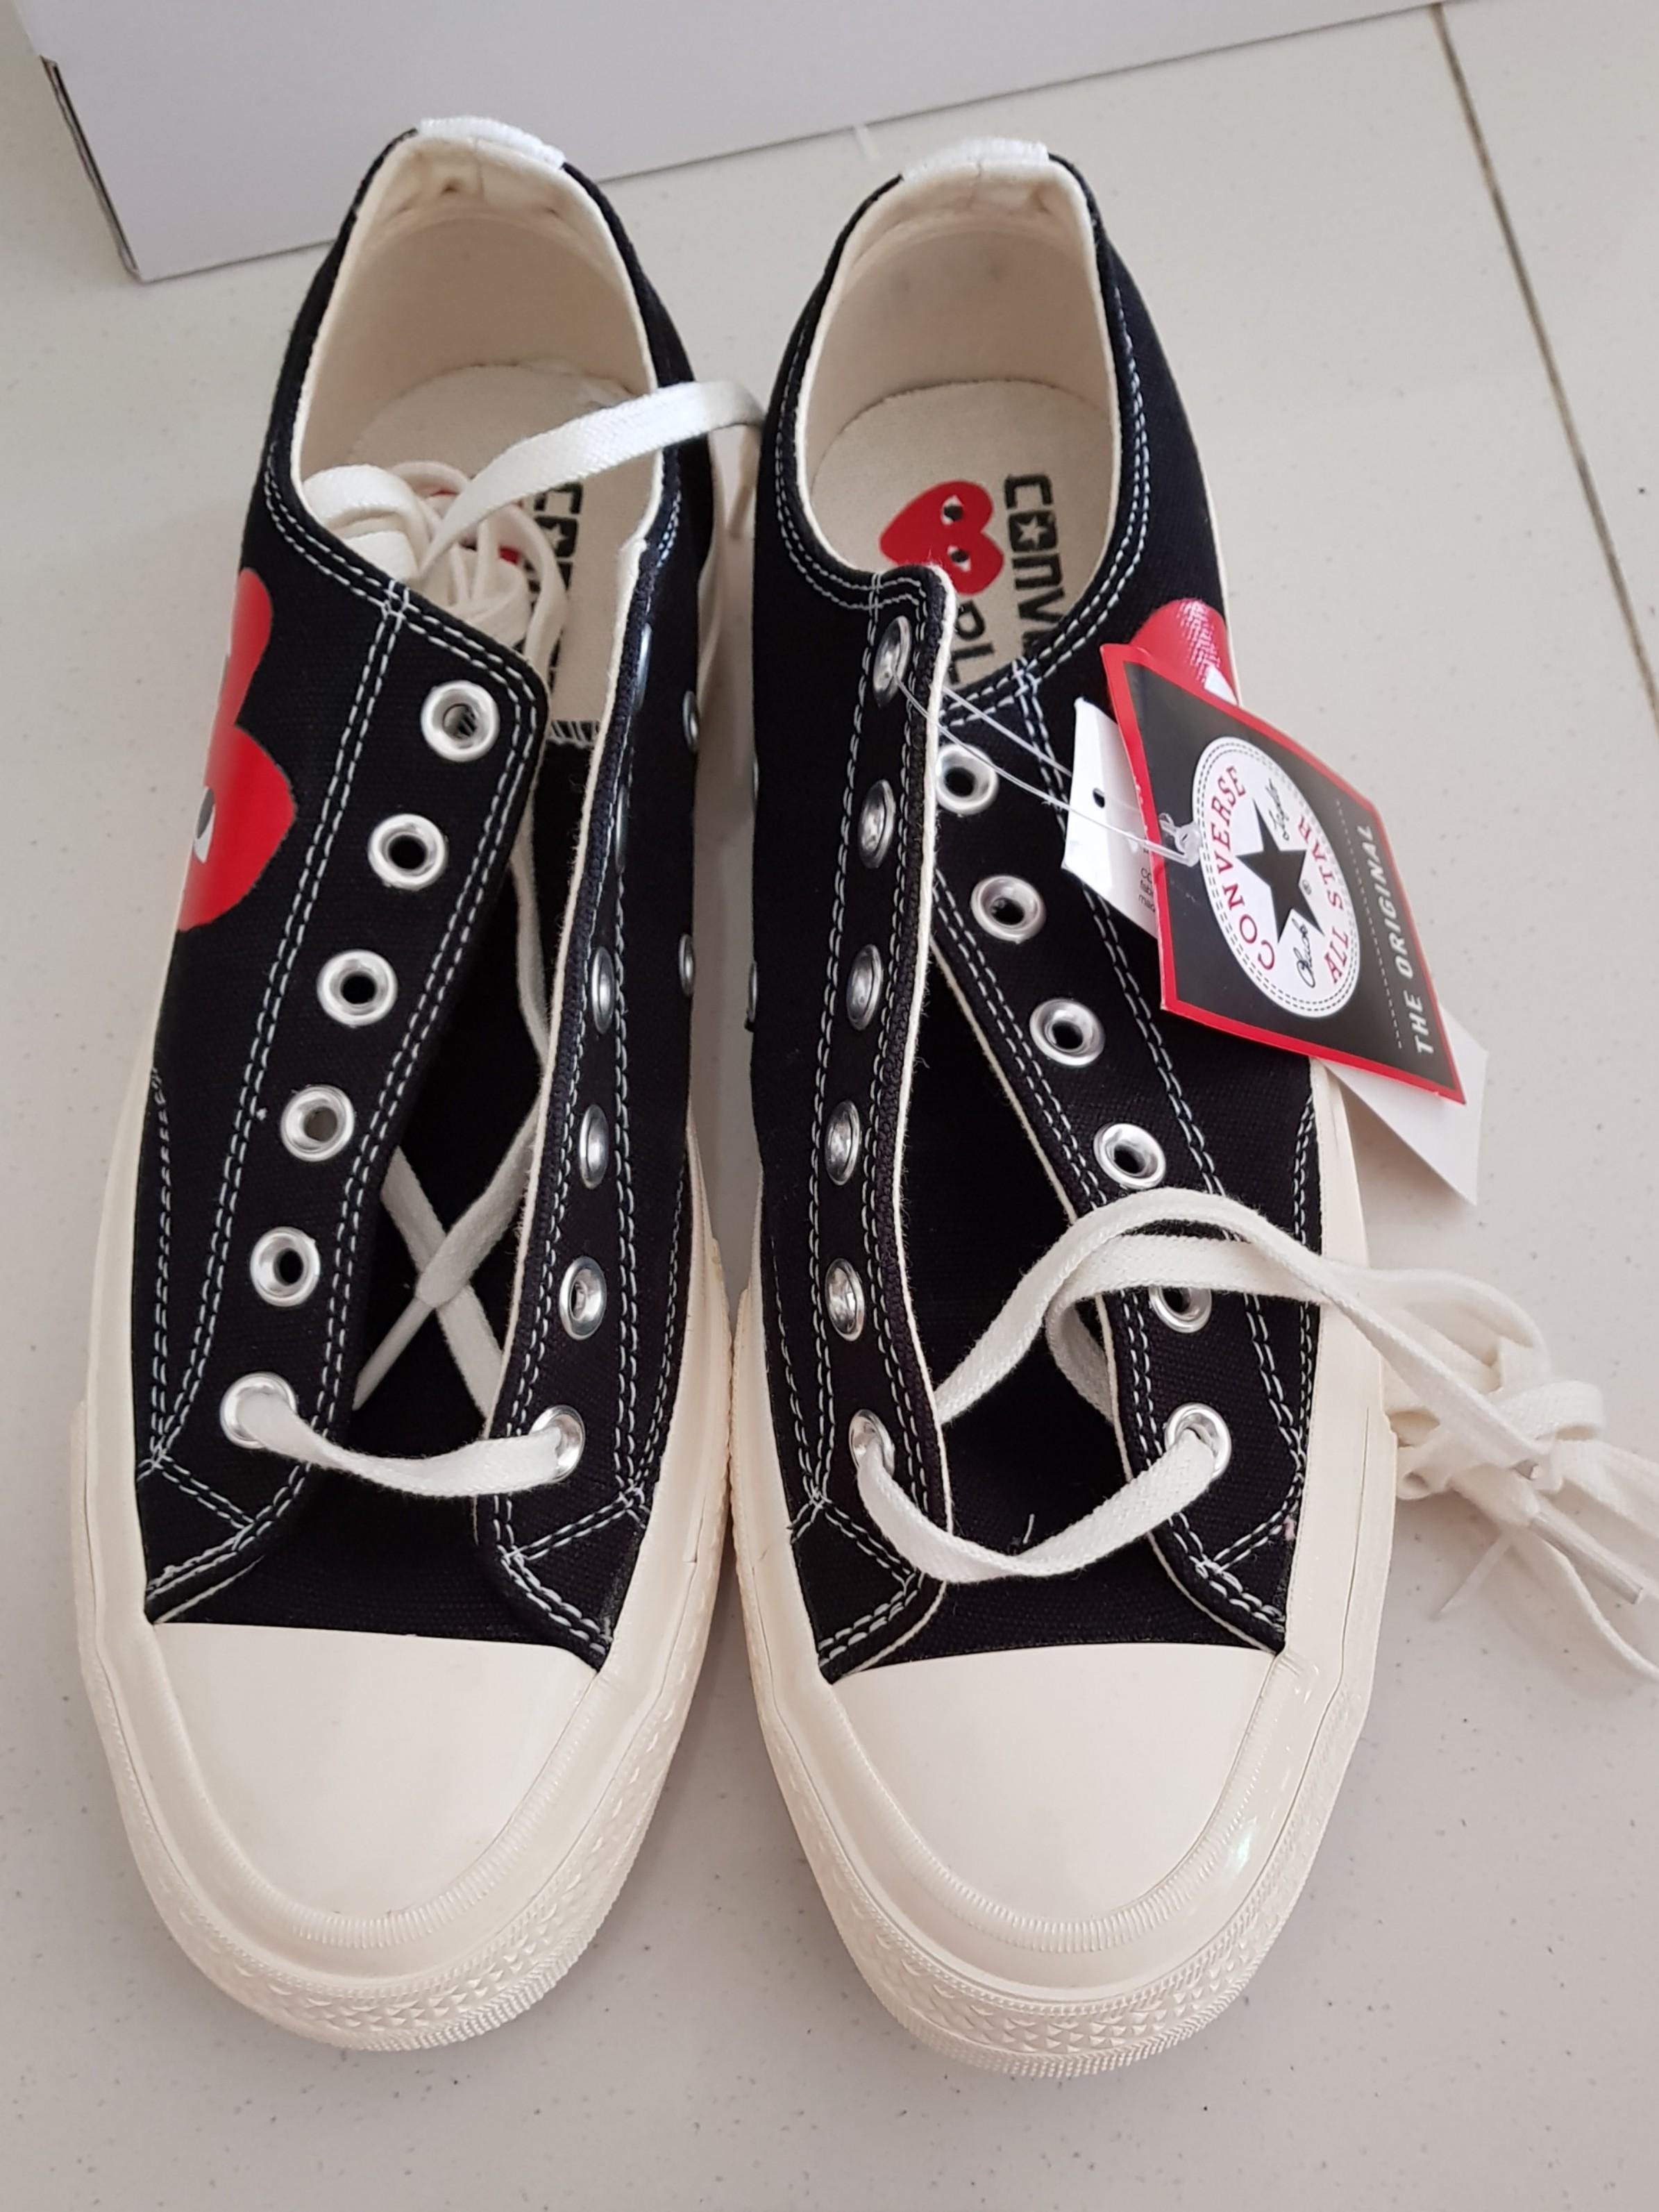 cdg converse black low top